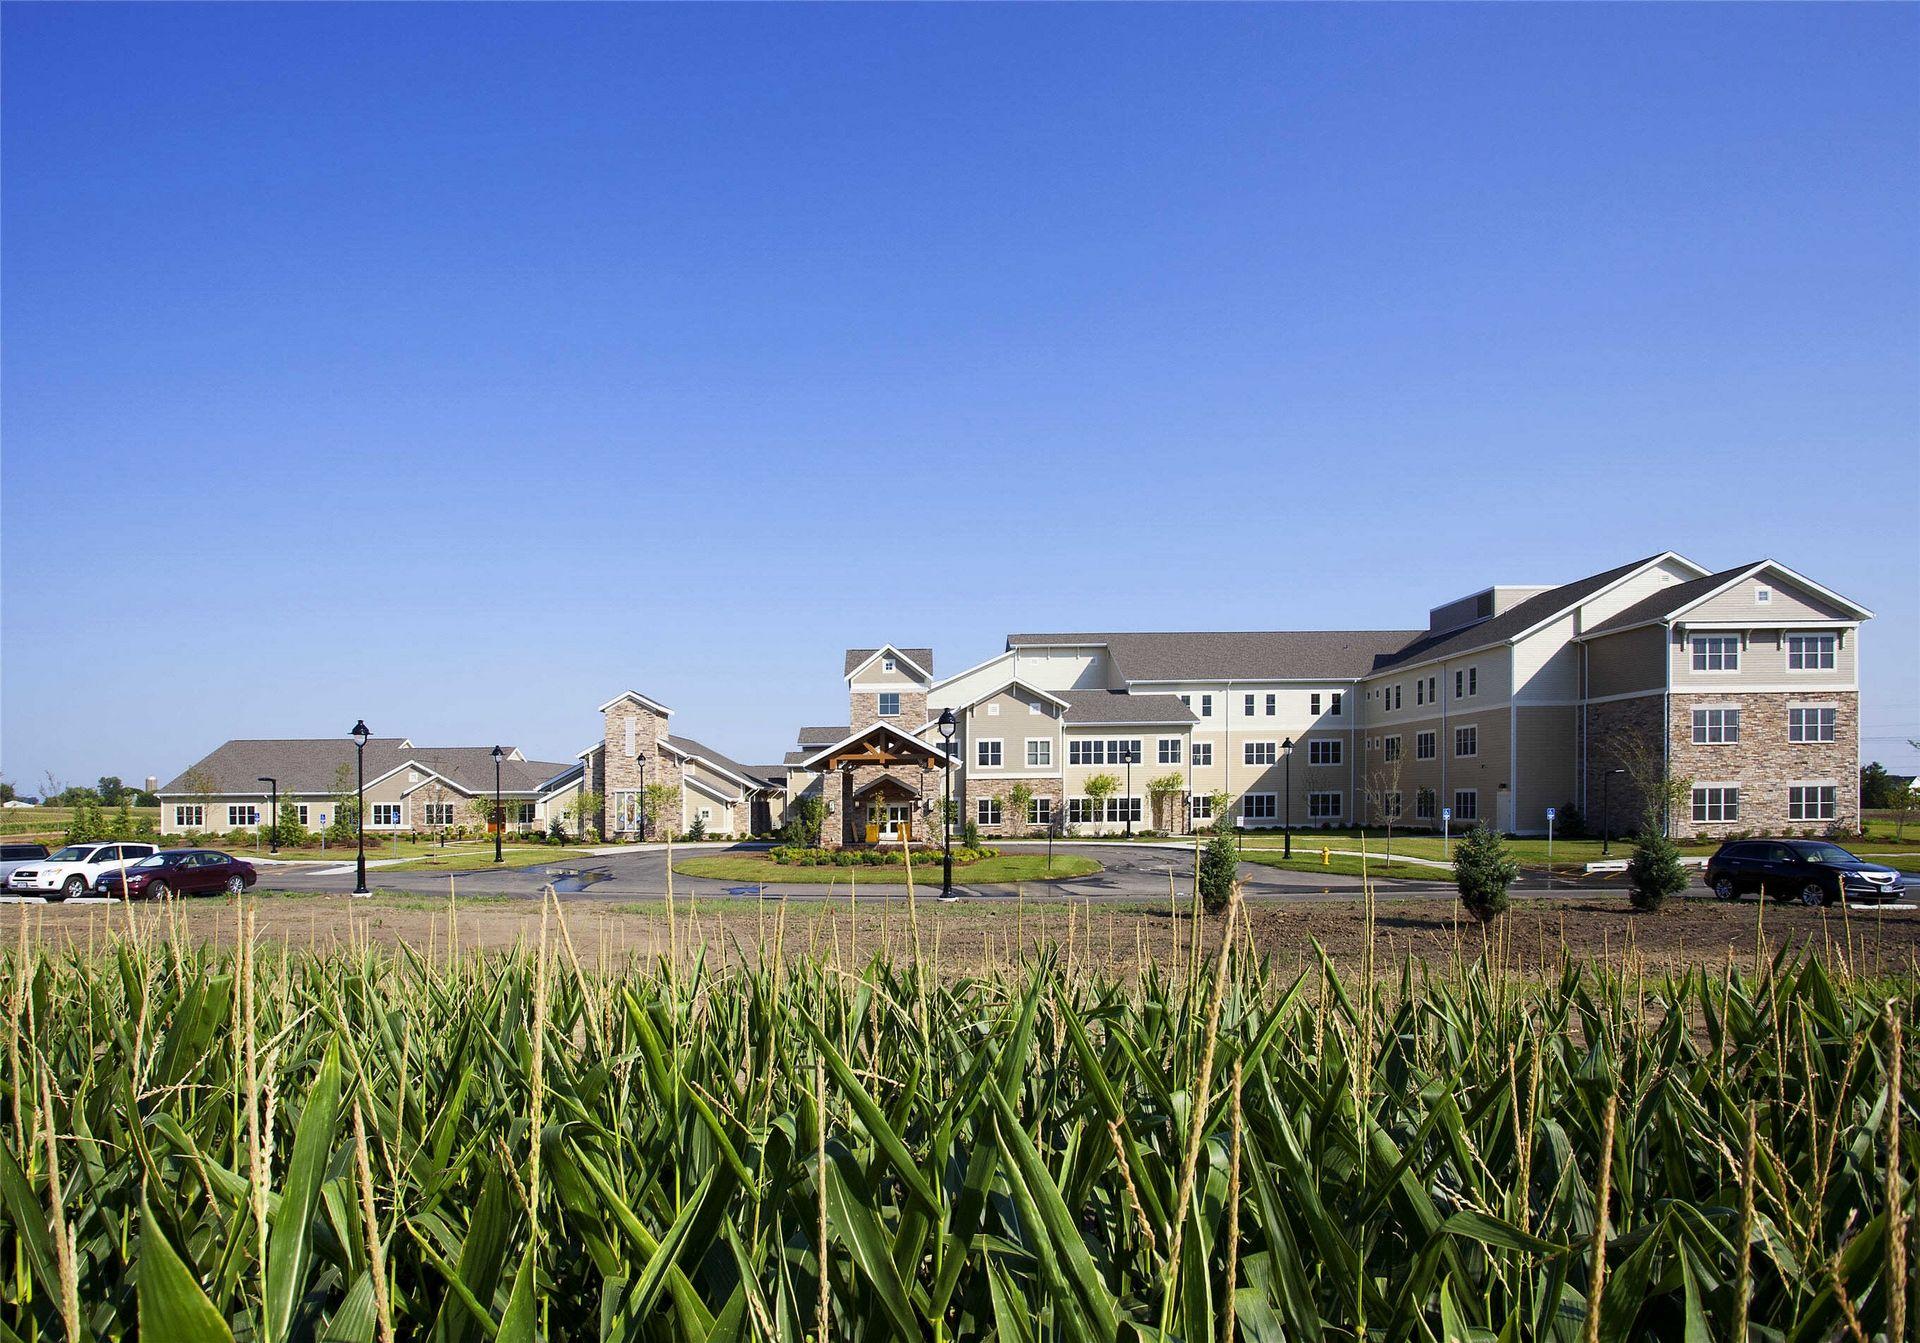 Kahl home for the aged davenport ia skilled nursing for Design homes iowa